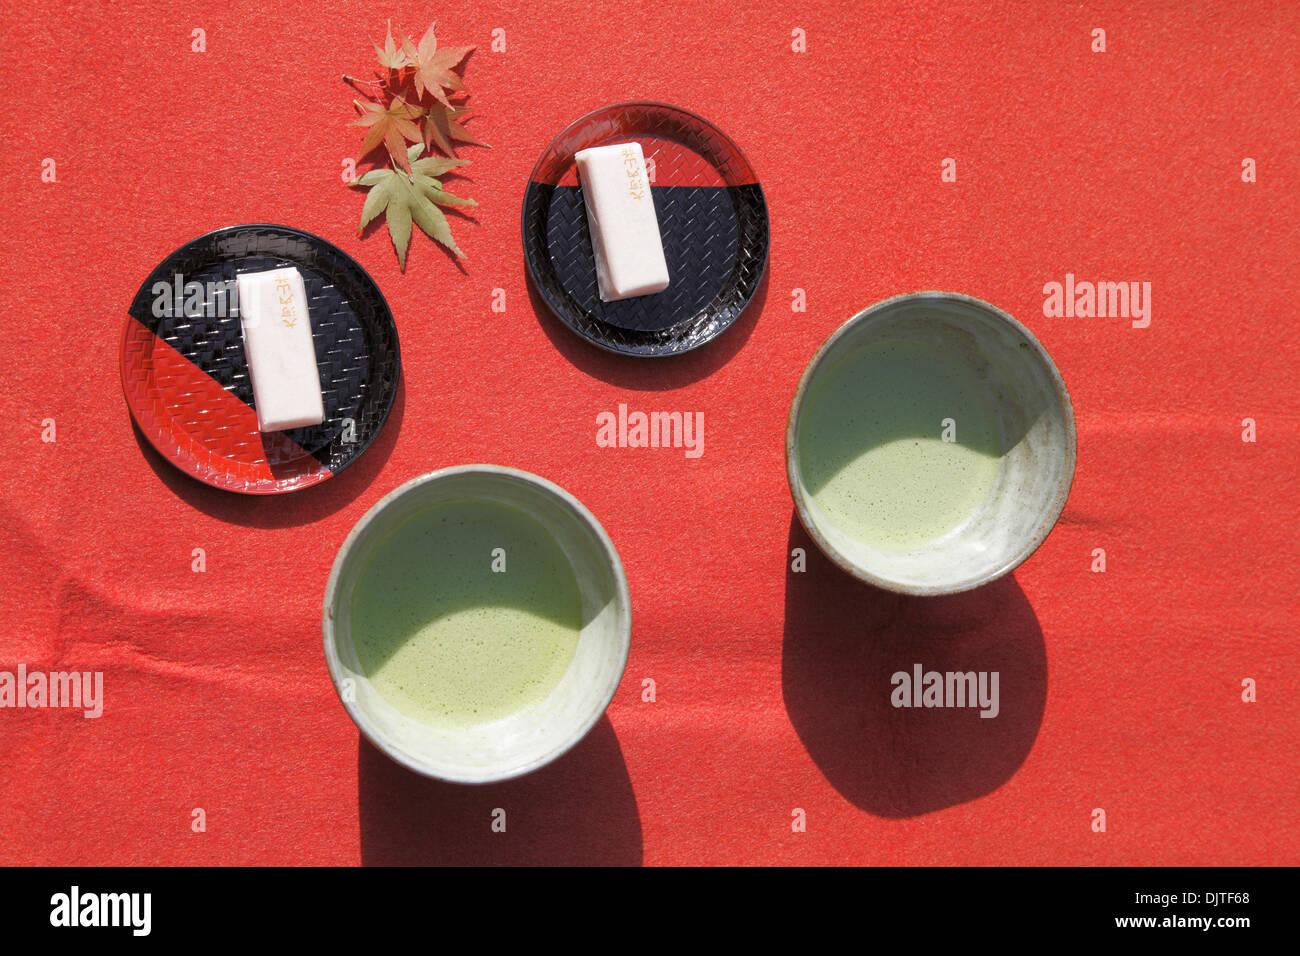 Japan, Kyoto, matcha powdered tea service, - Stock Image